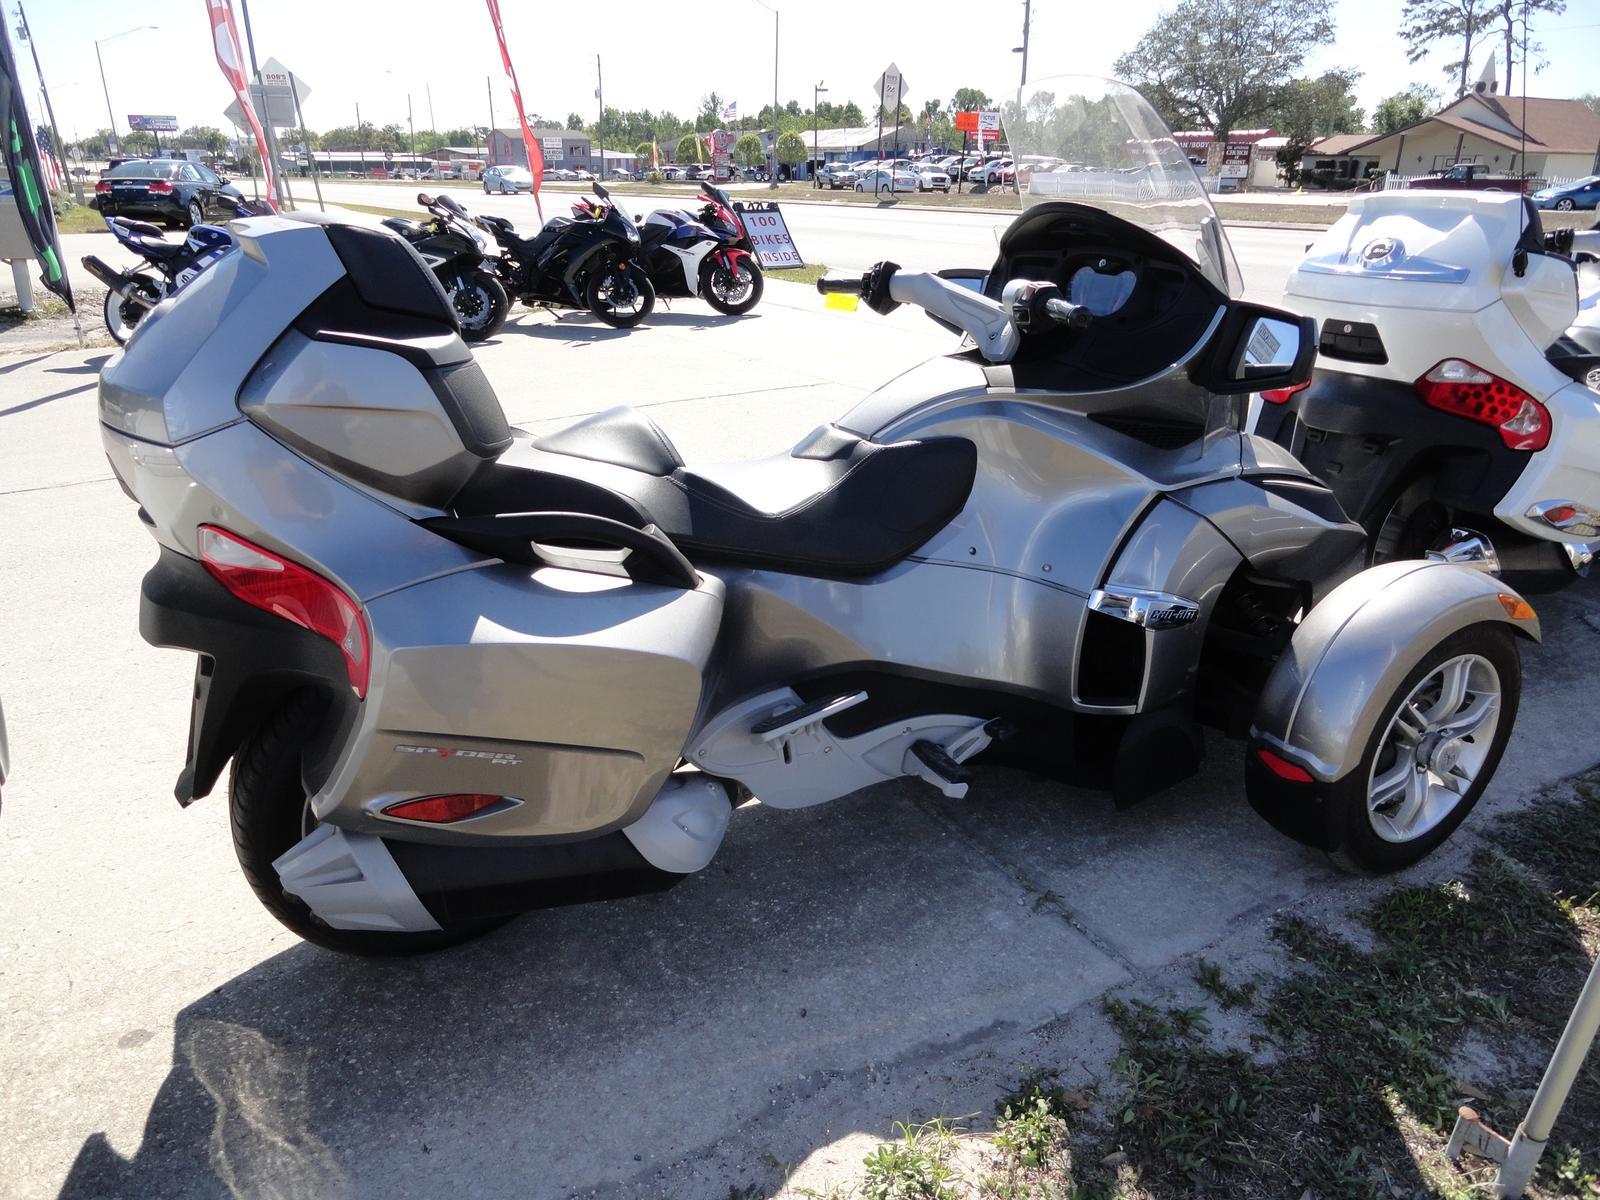 2012 Can Am Spyder RT S for sale in Longwood FL